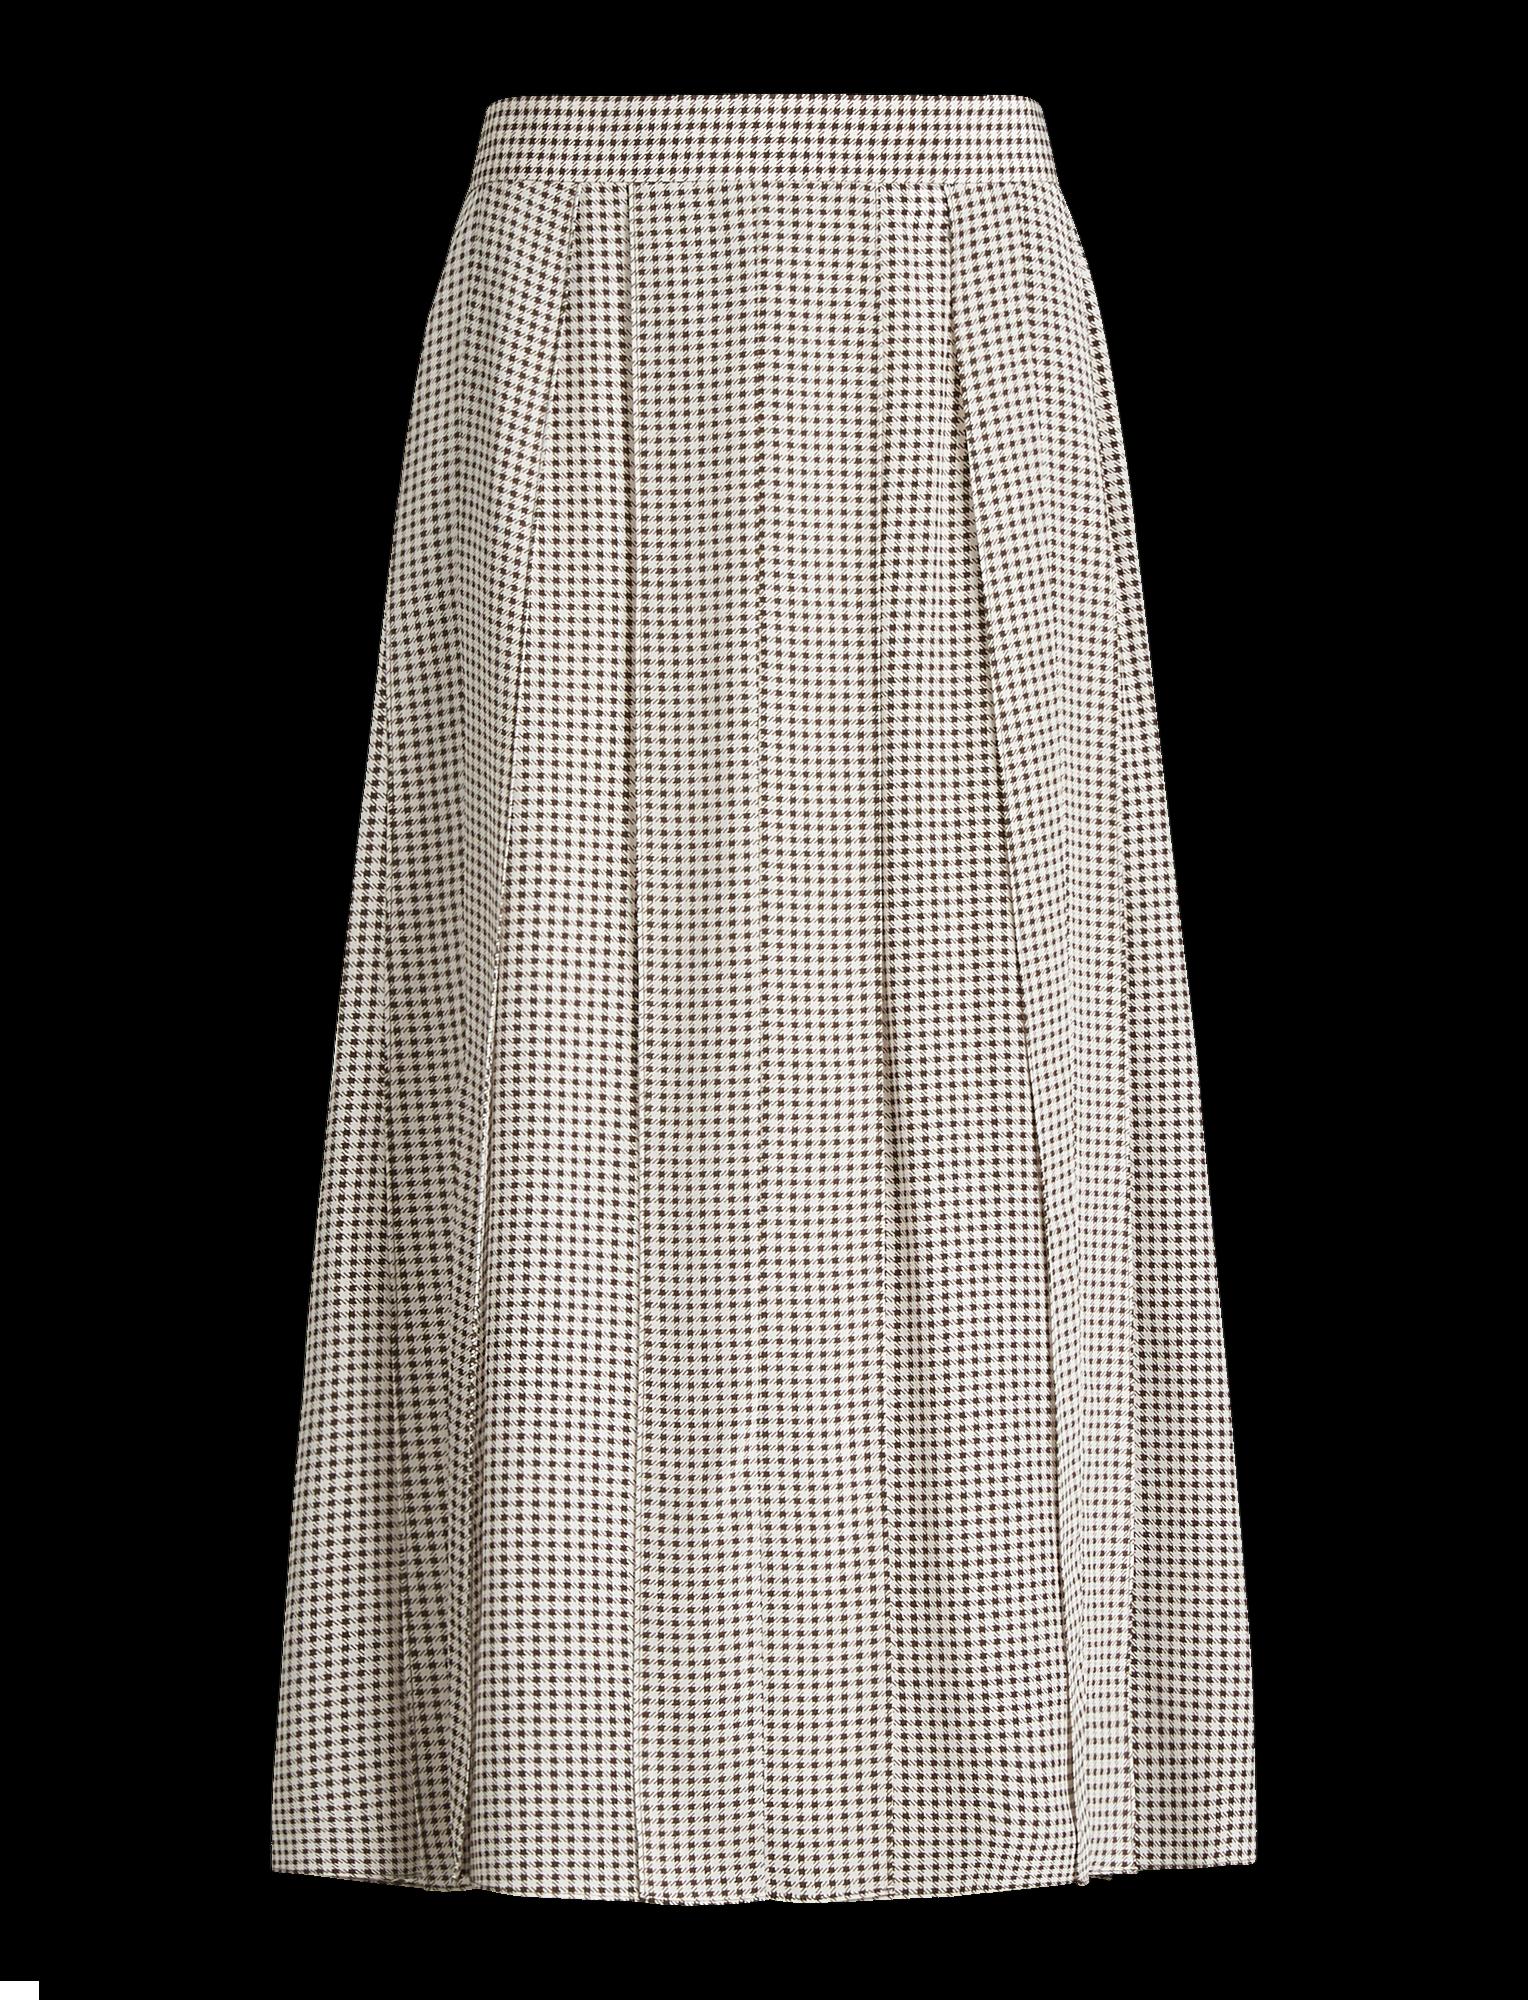 Joseph, Charlie Pied De Poule Skirt, in SHERBERT